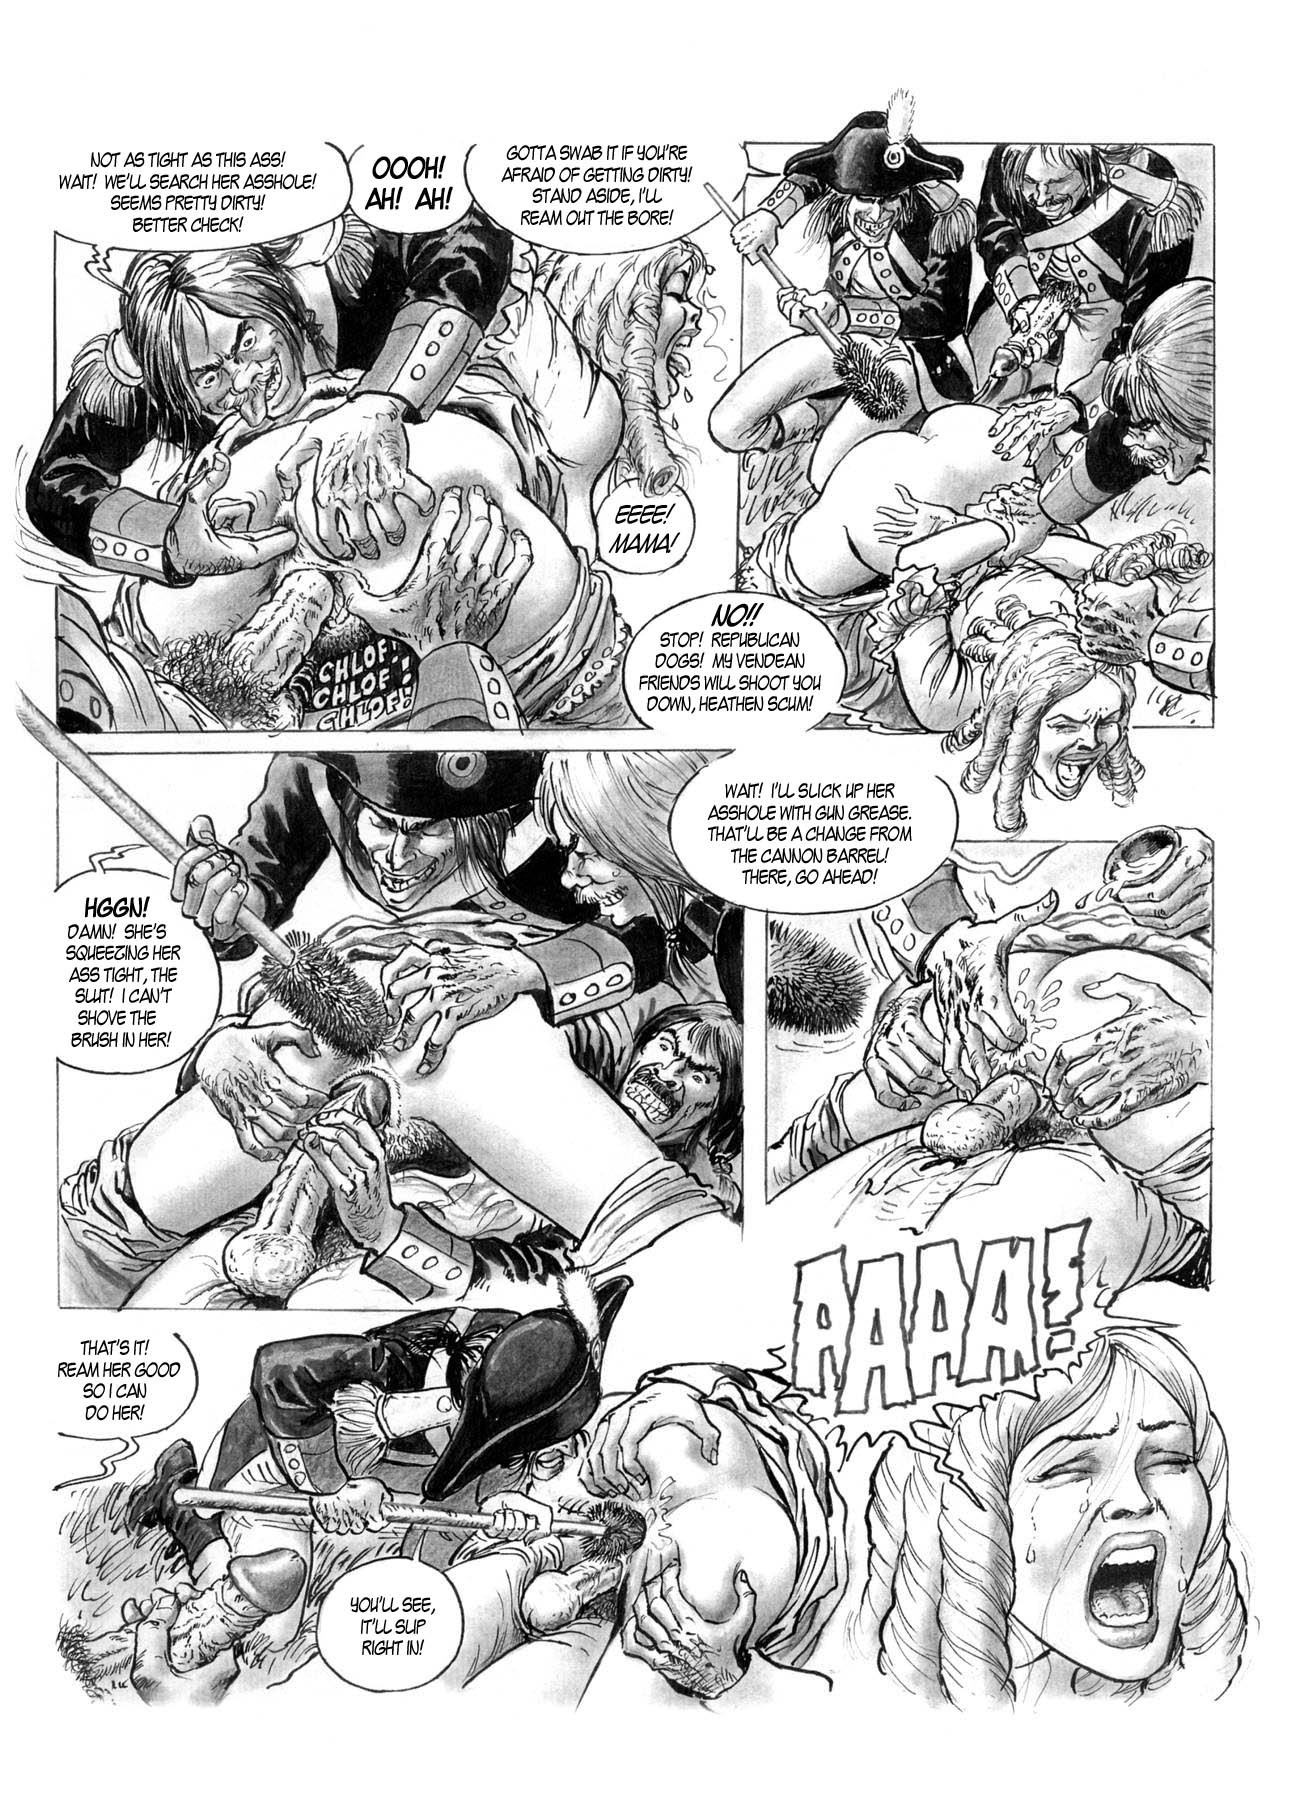 Fuck that's free erotic art comics got dicked